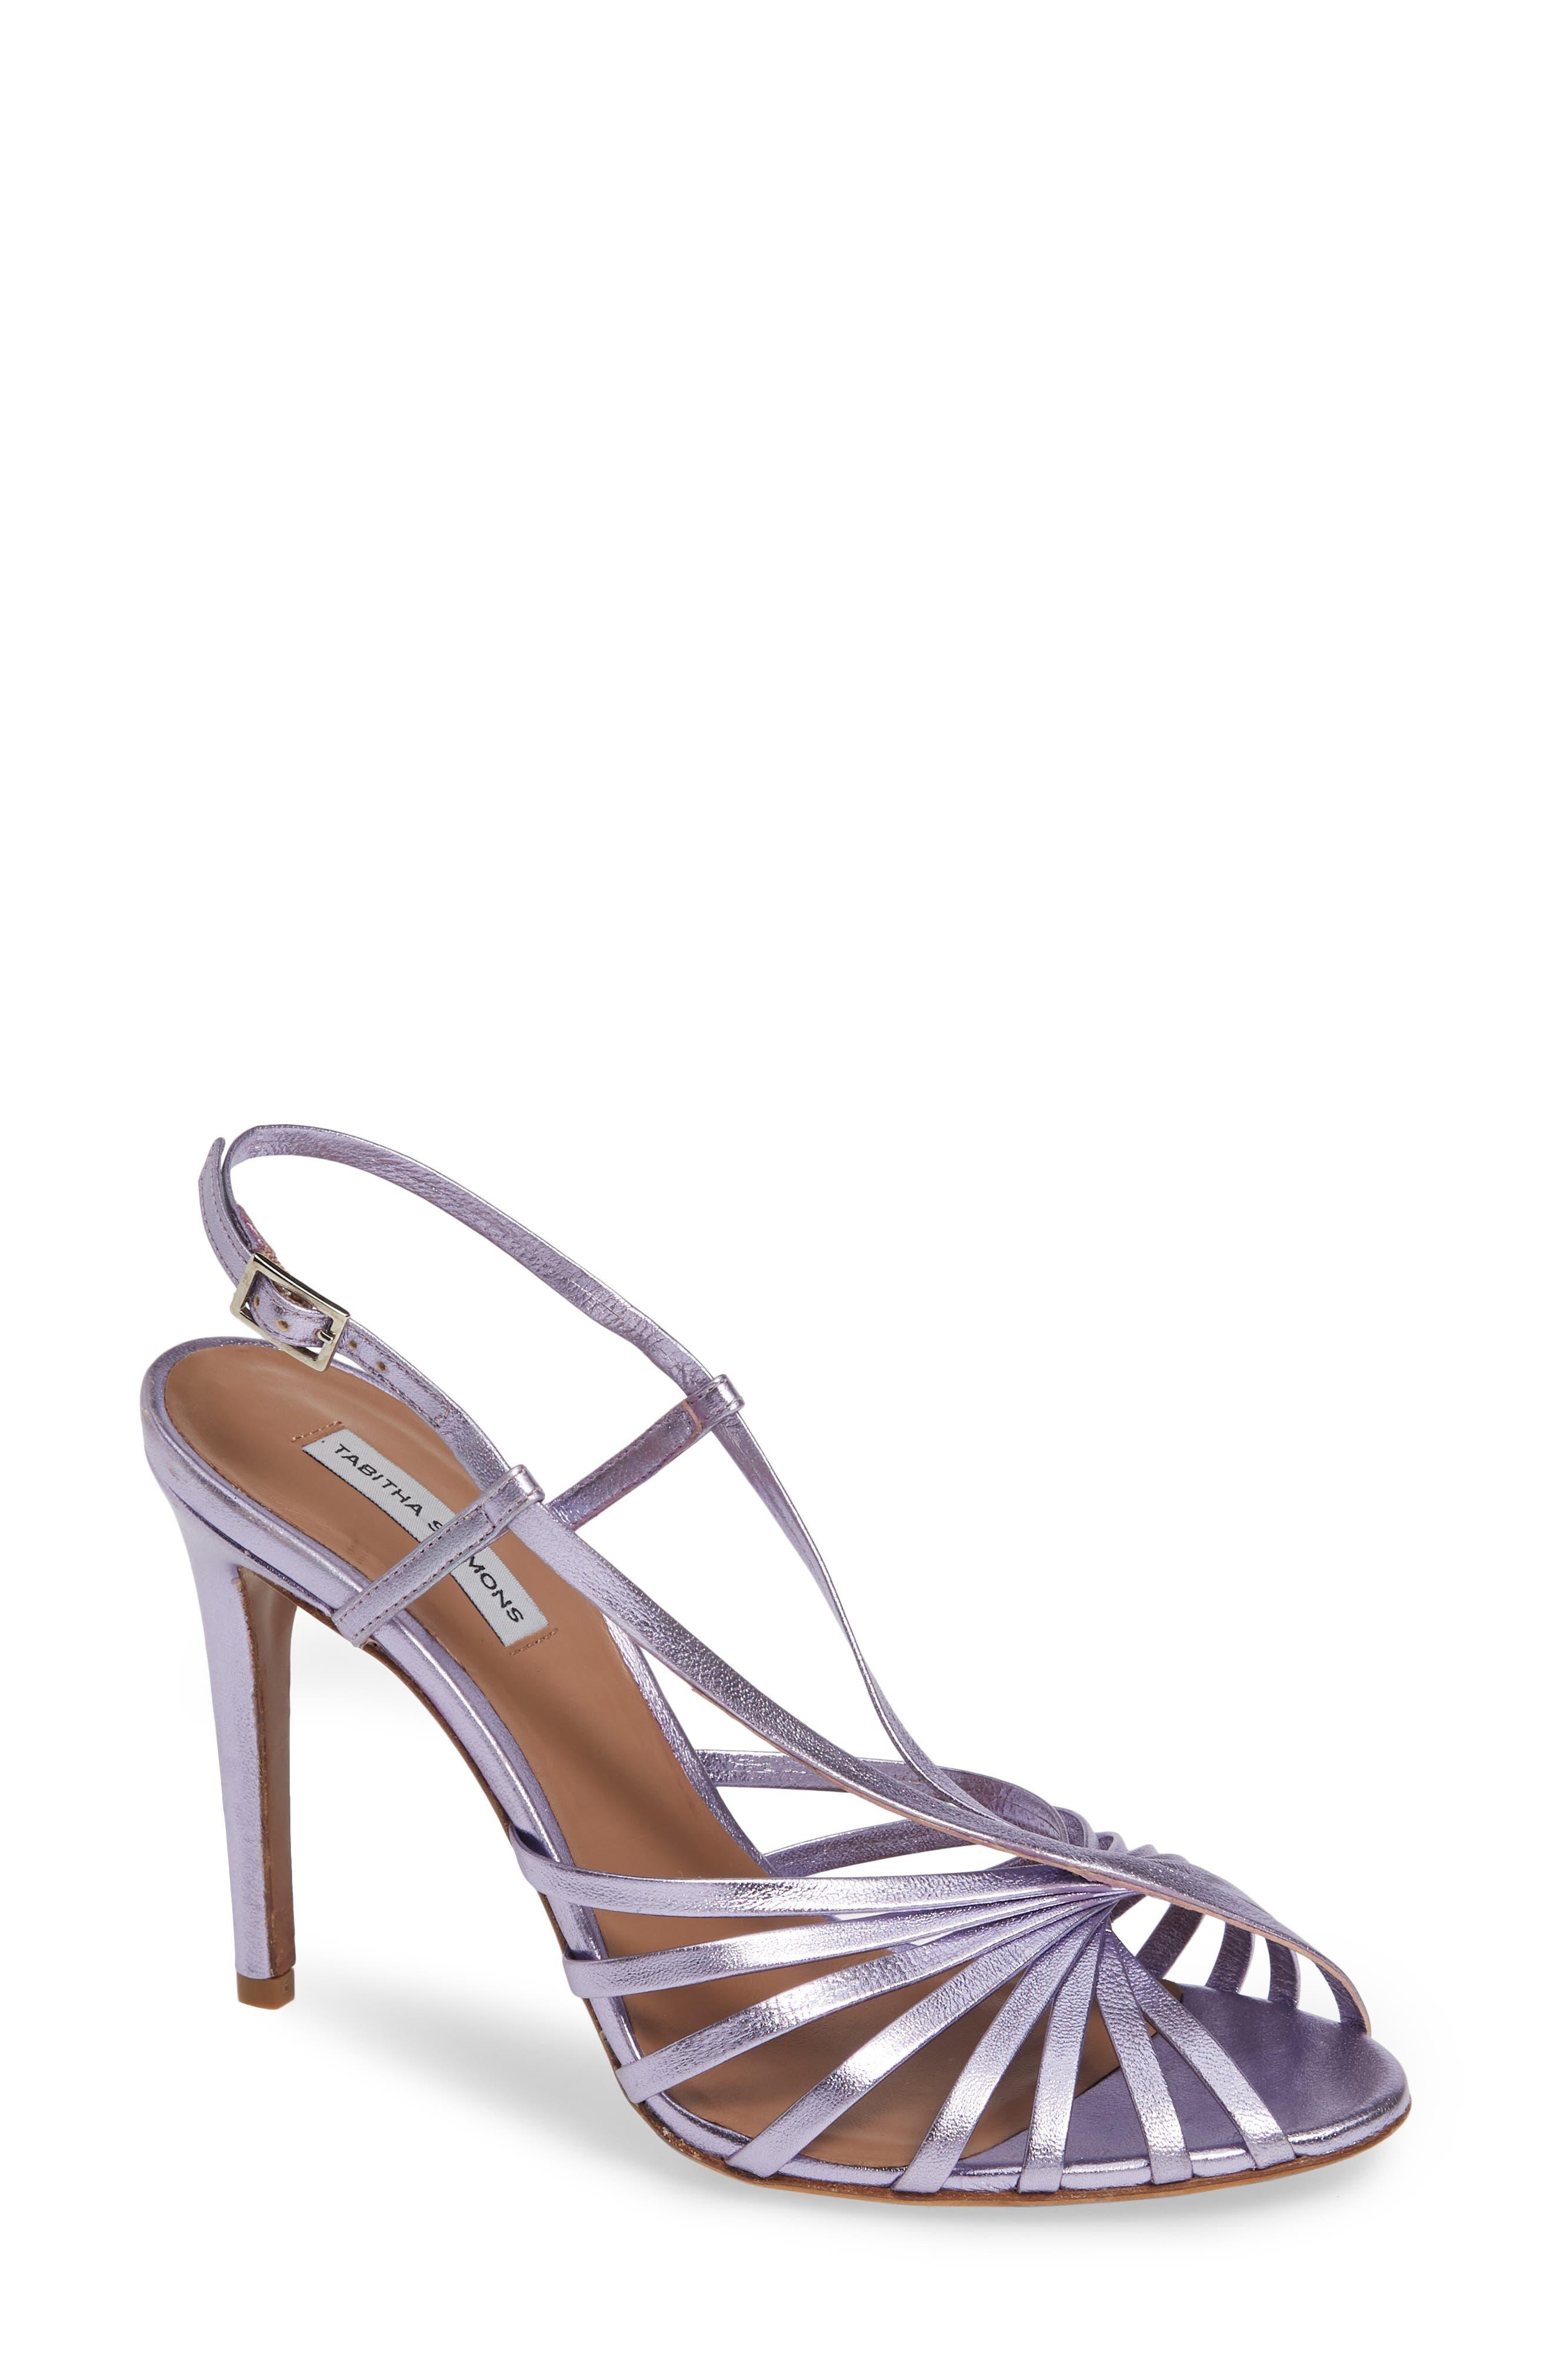 Tabitha Simmons Jazz Strappy Sandal - Purple